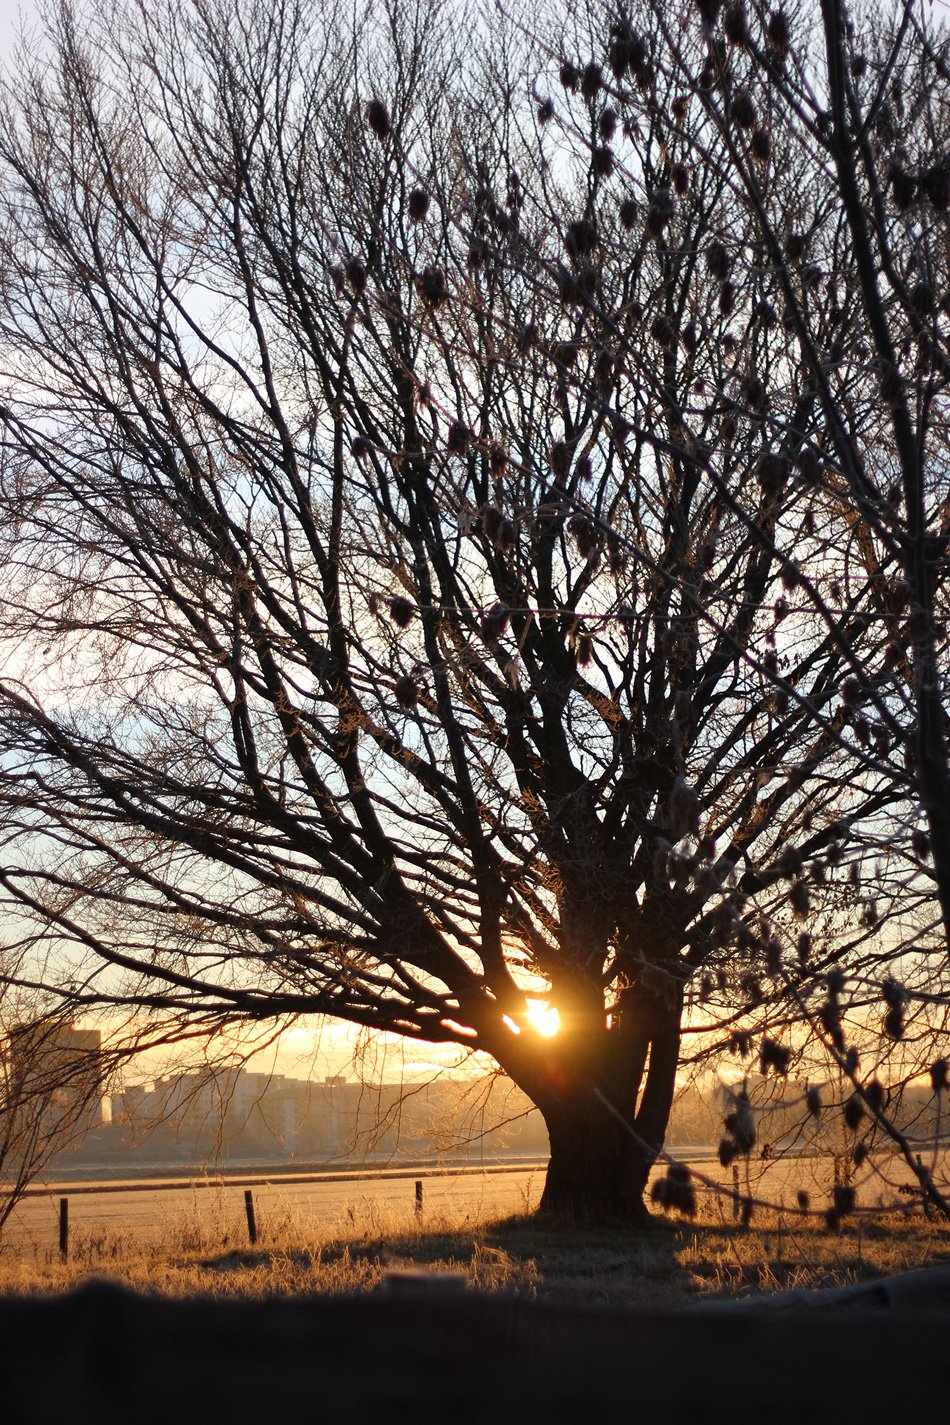 IMG_0003a_Natur_Baum_Winter_Sonne_cold_sun_ConnyDoll